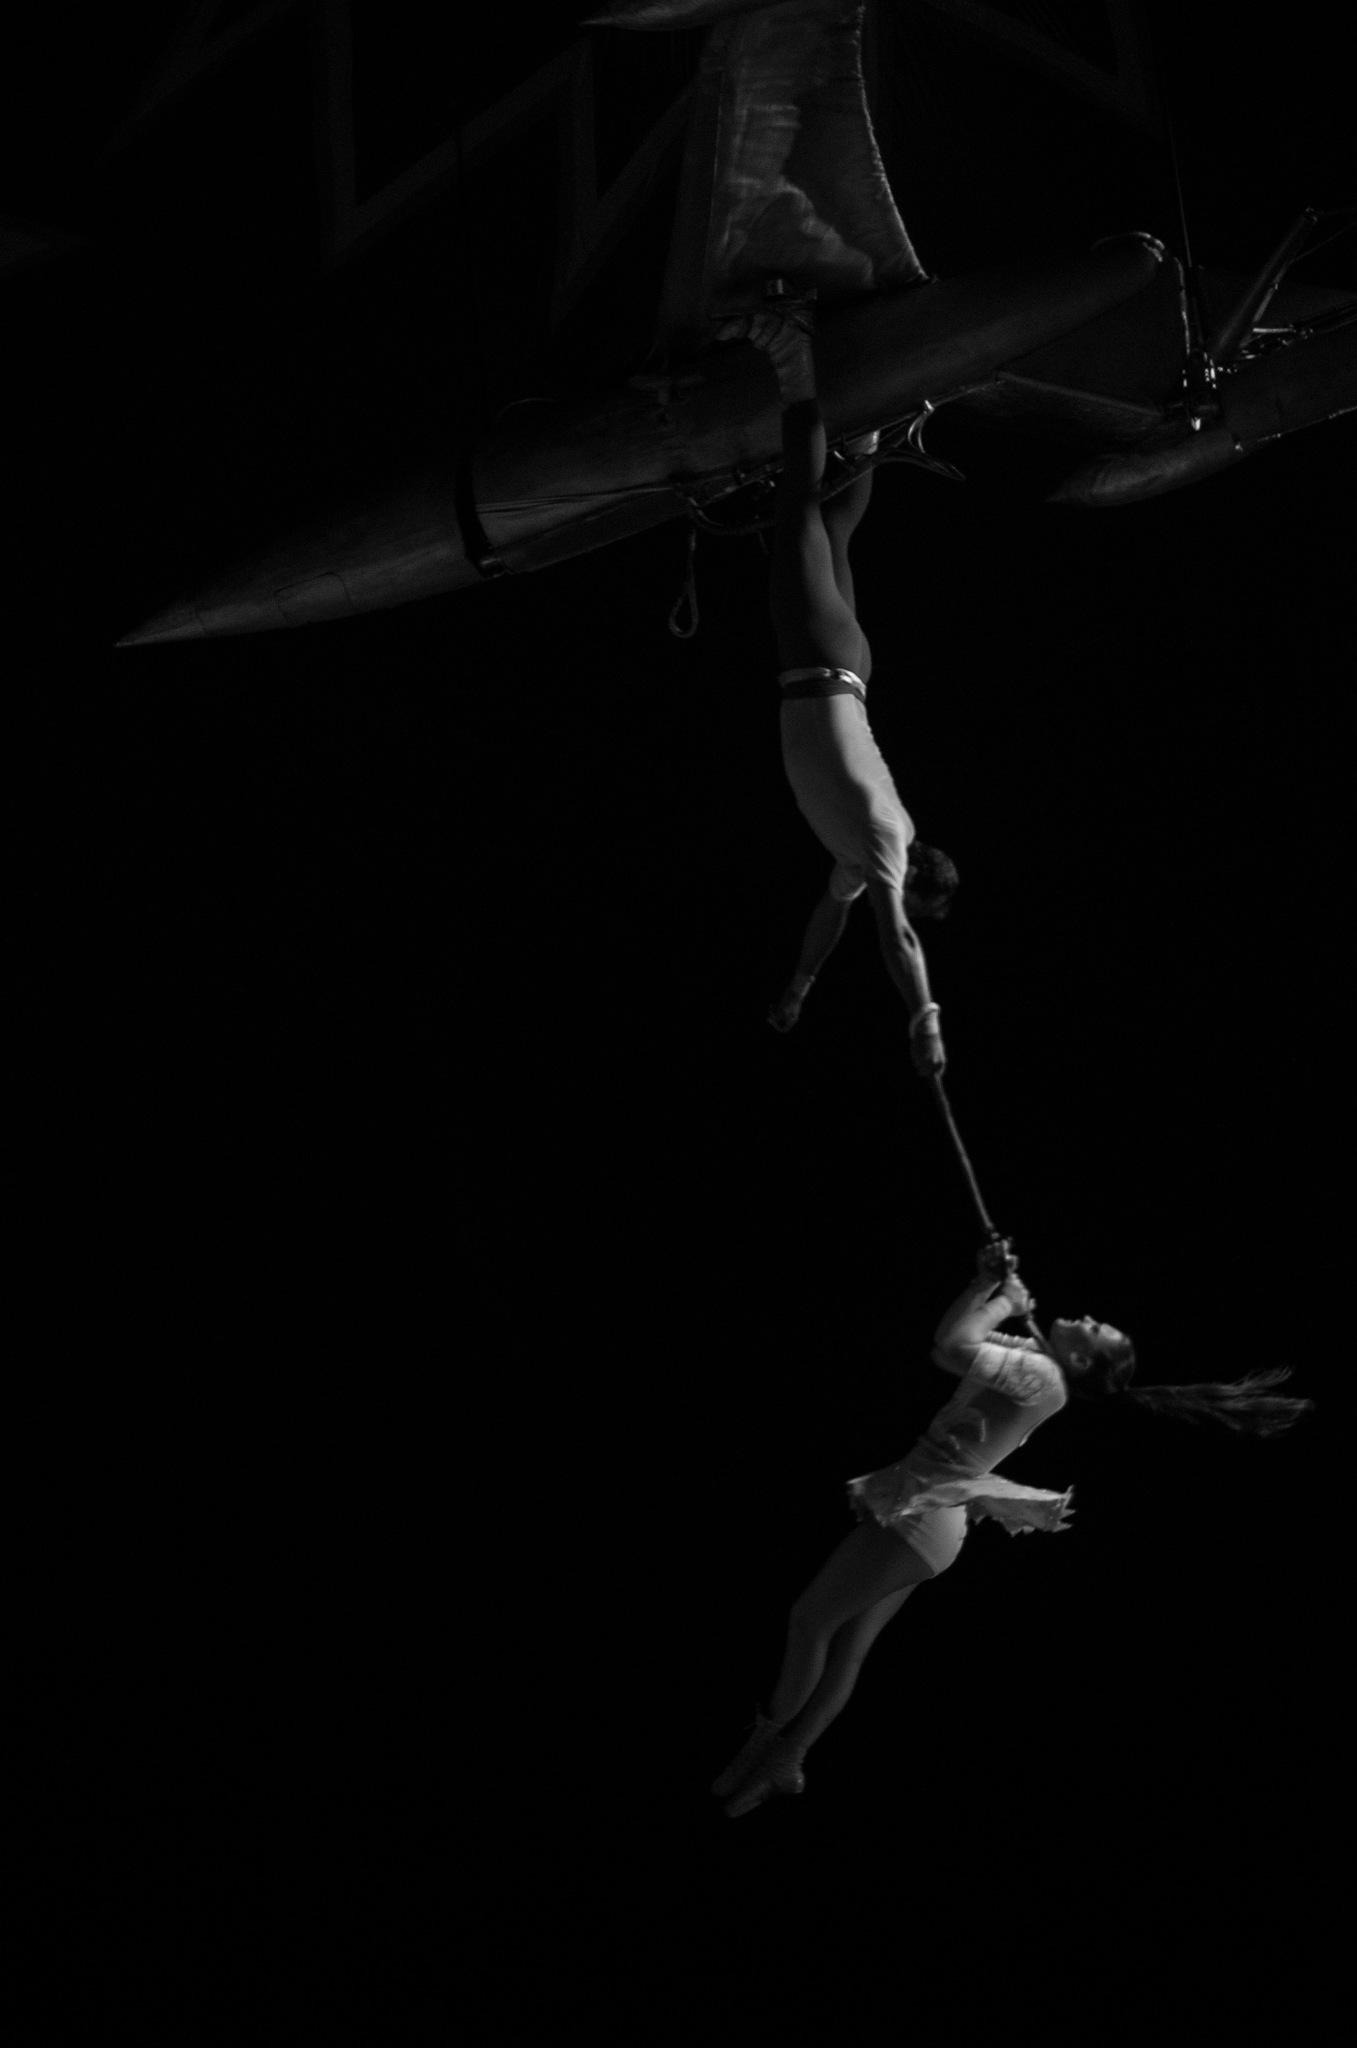 Circo Spadoni by Alexandre Rossi Gurgel